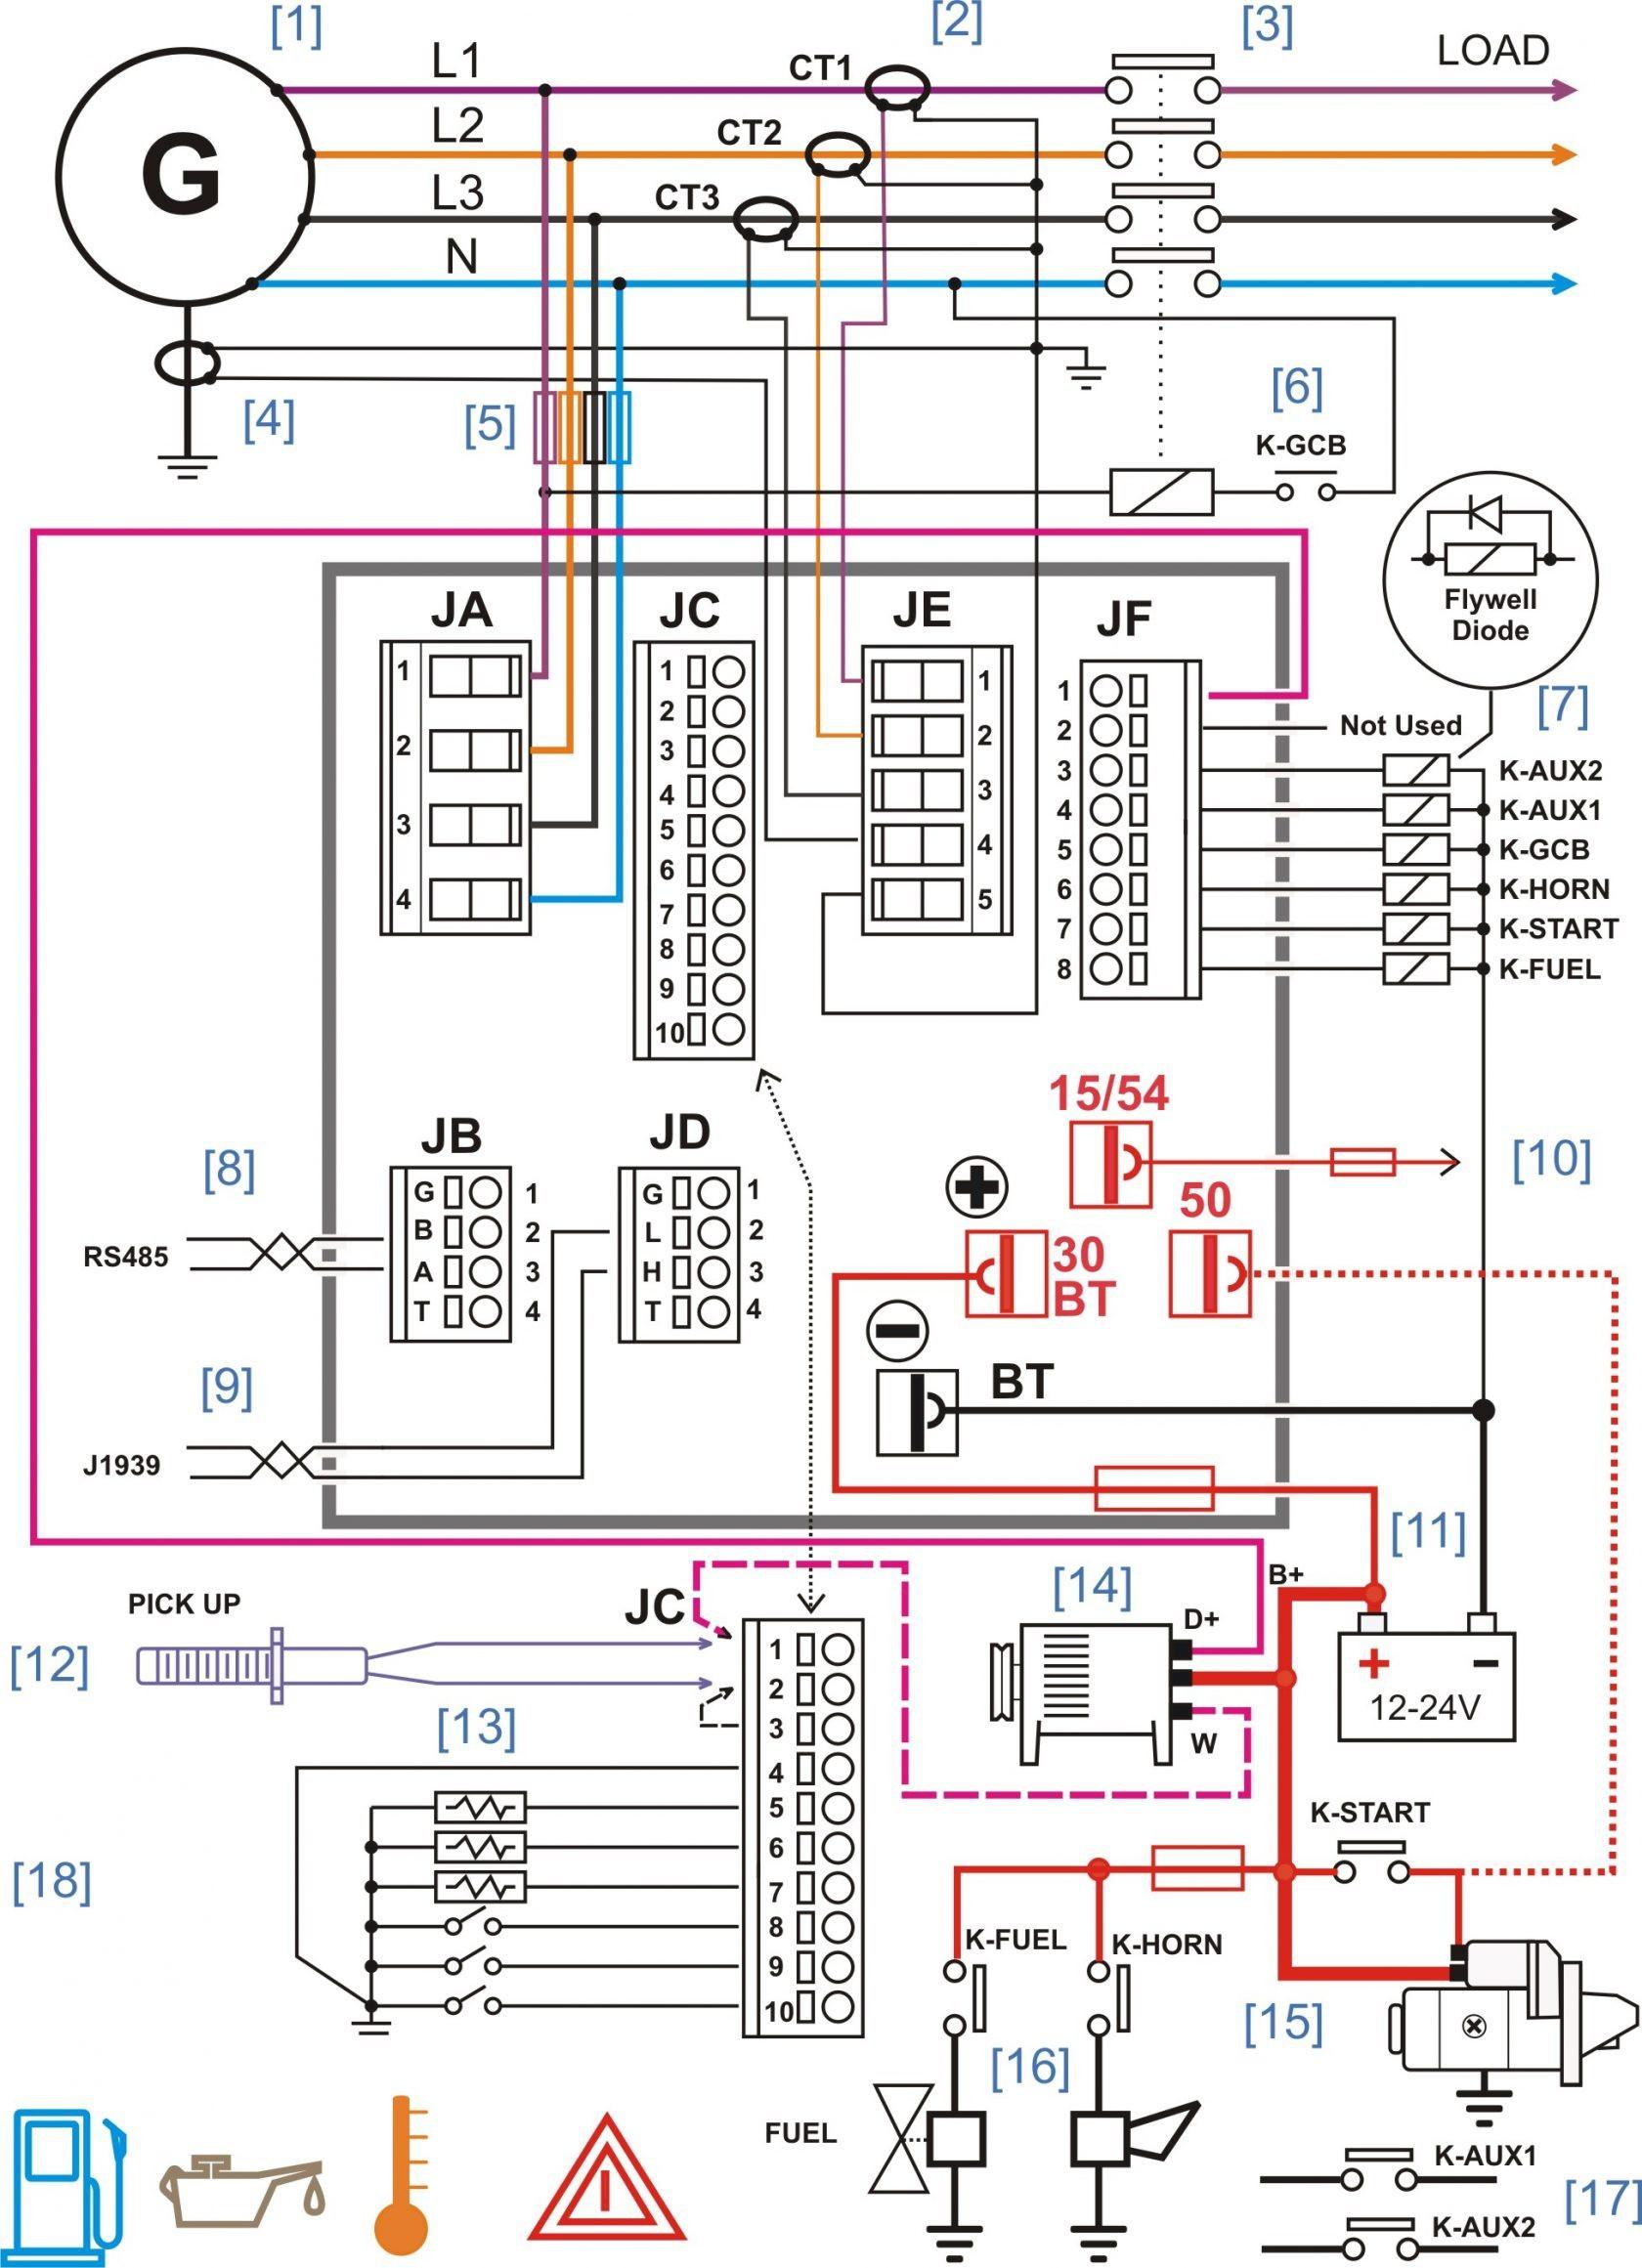 Rv Power Converter Wiring Diagram Unique Distribution Box Wiring Diagram Rv Inverter In Progressive